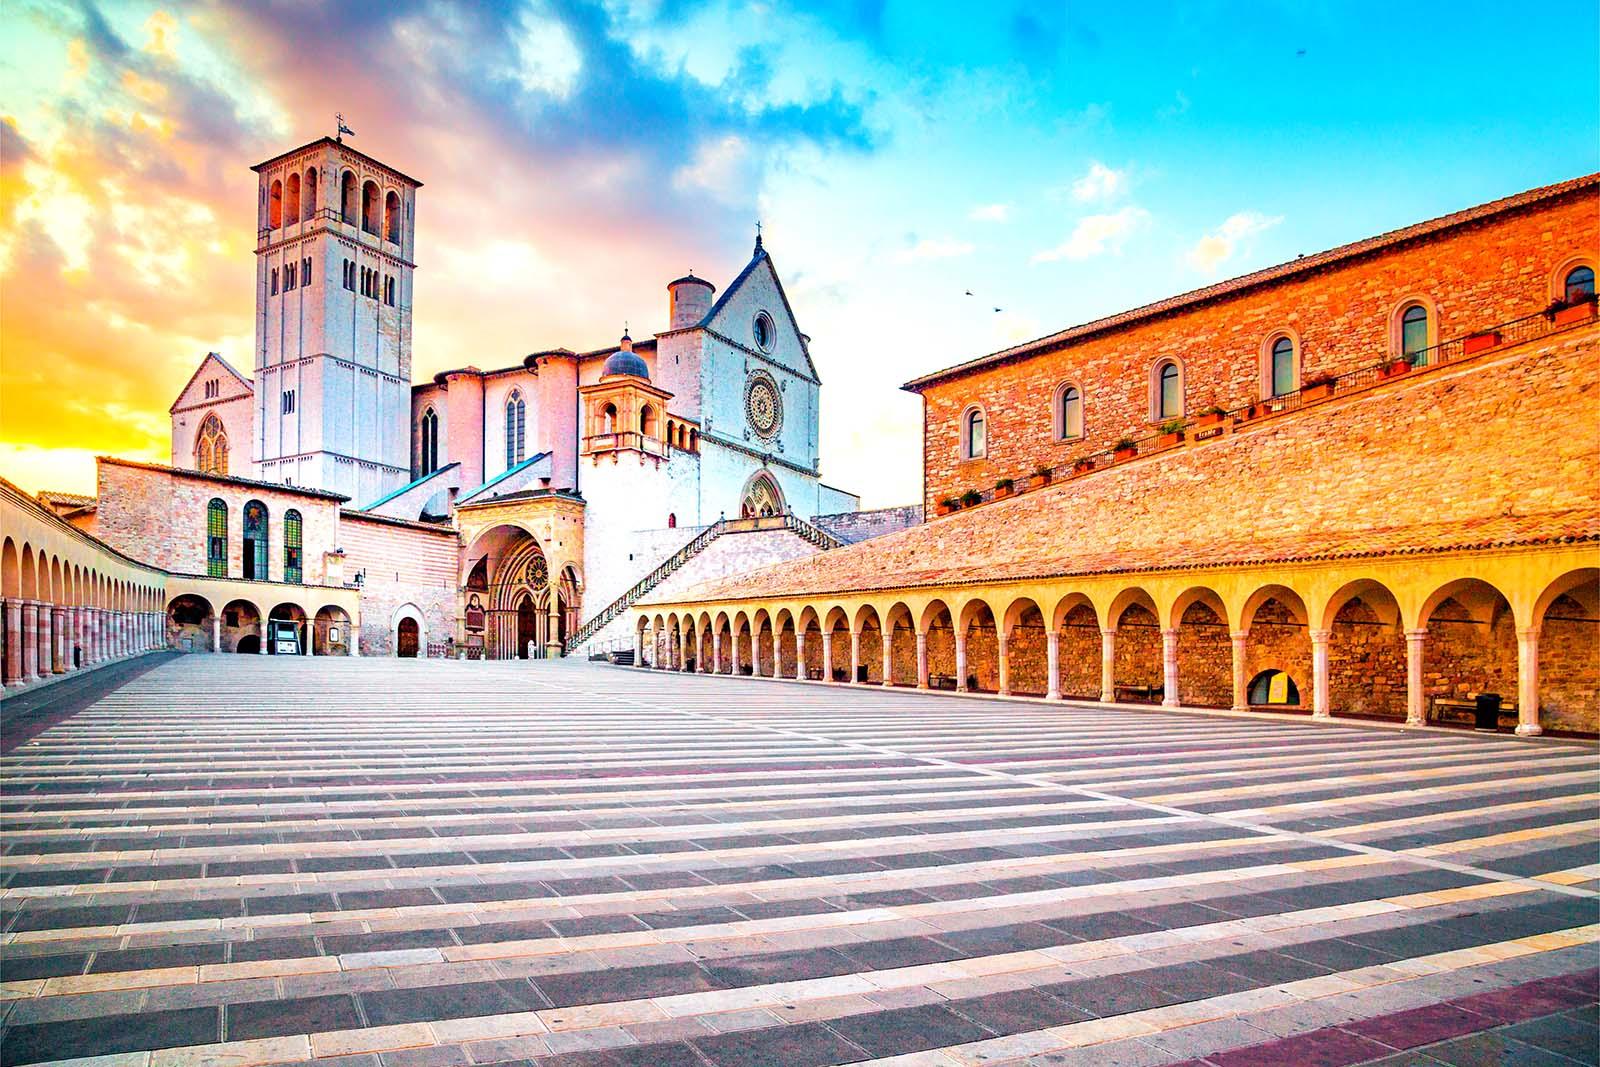 St Francis of Assisi Basilica